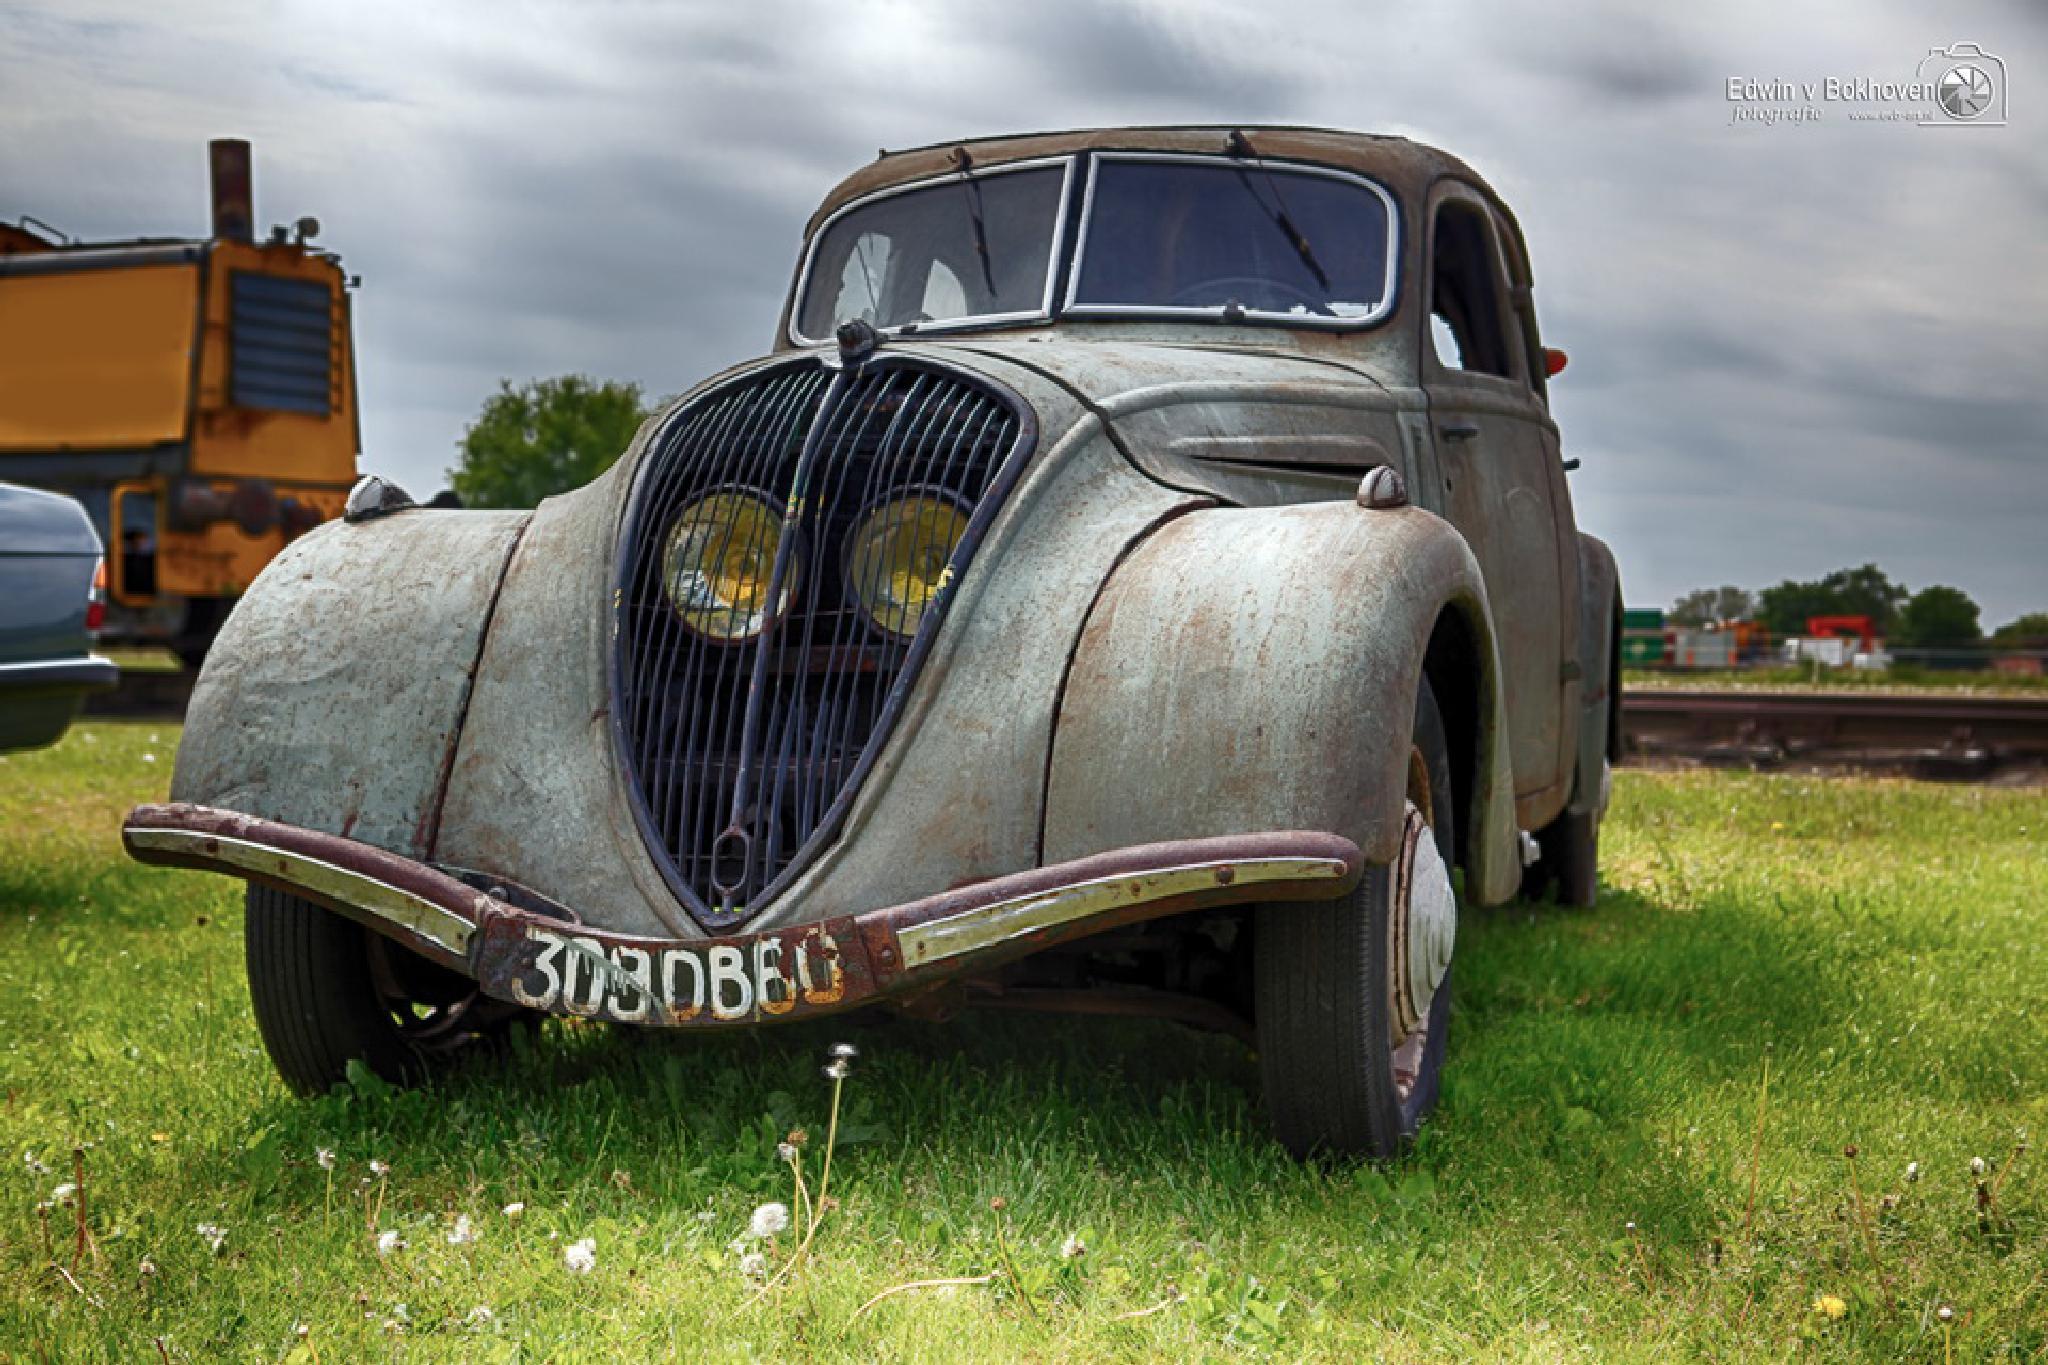 Peugeot 402 by edwin.vanbokhoven